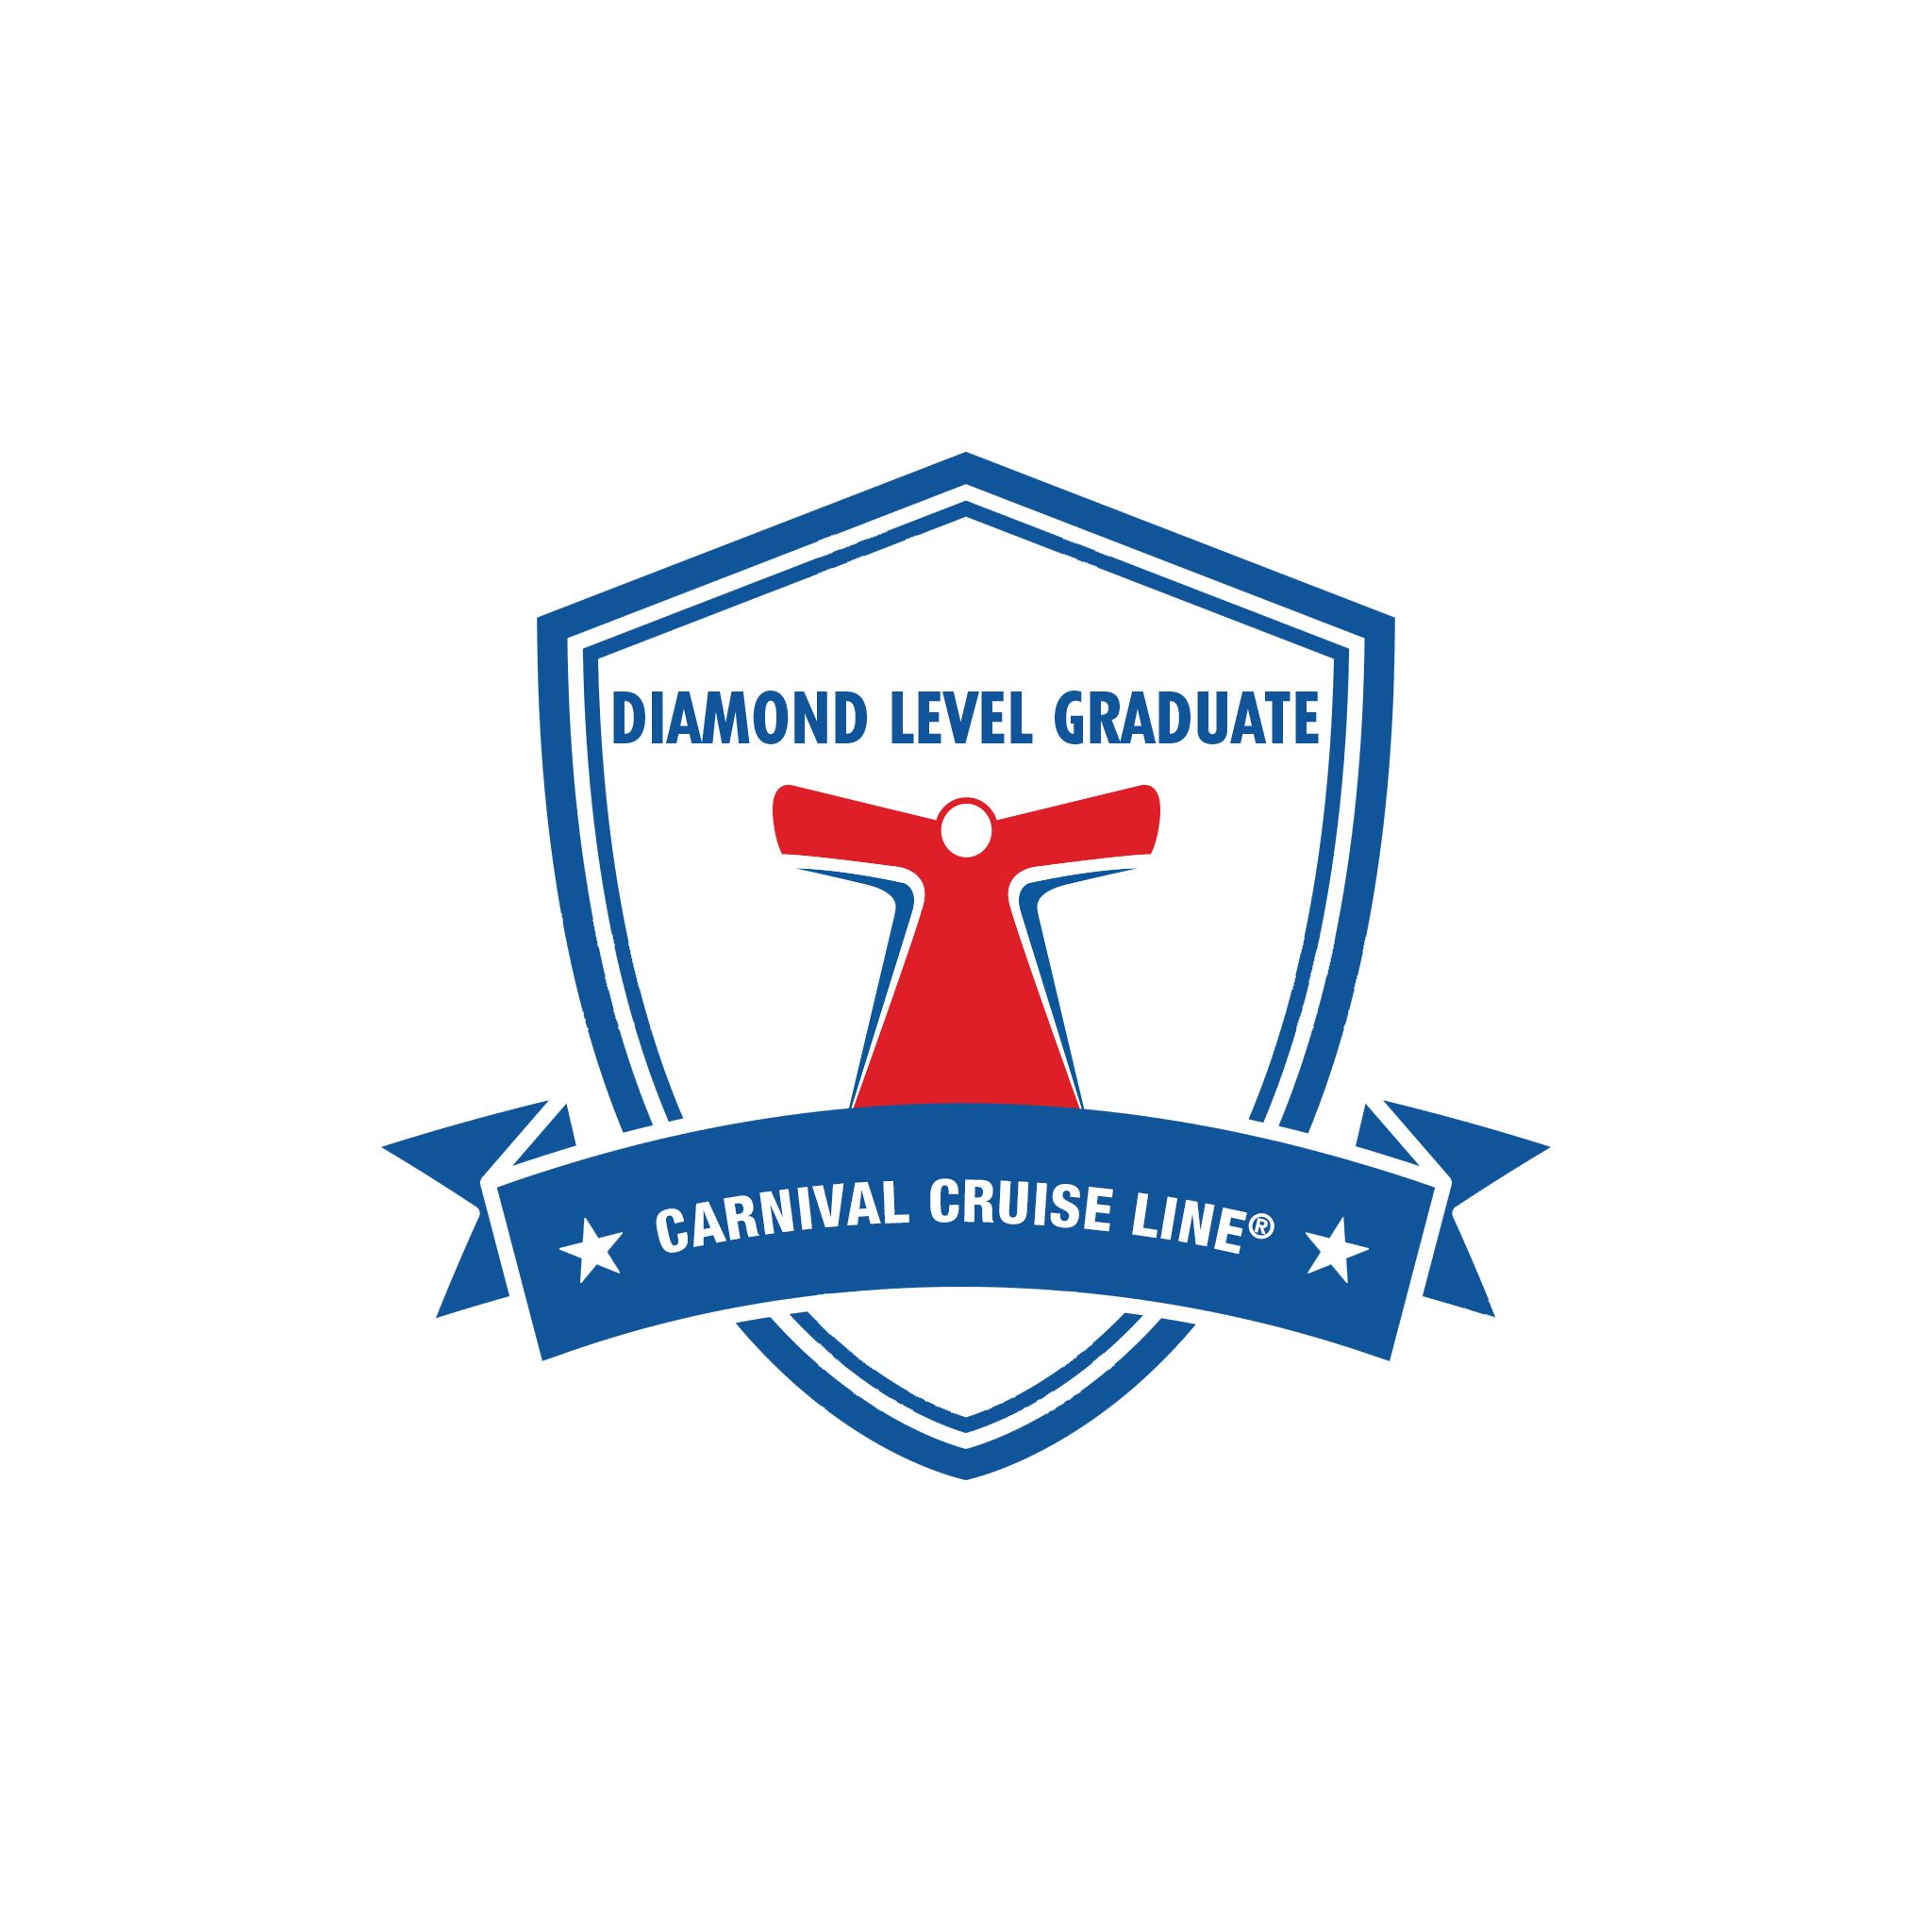 Carnival Cruises - Diamond Level Graduate (Logo)